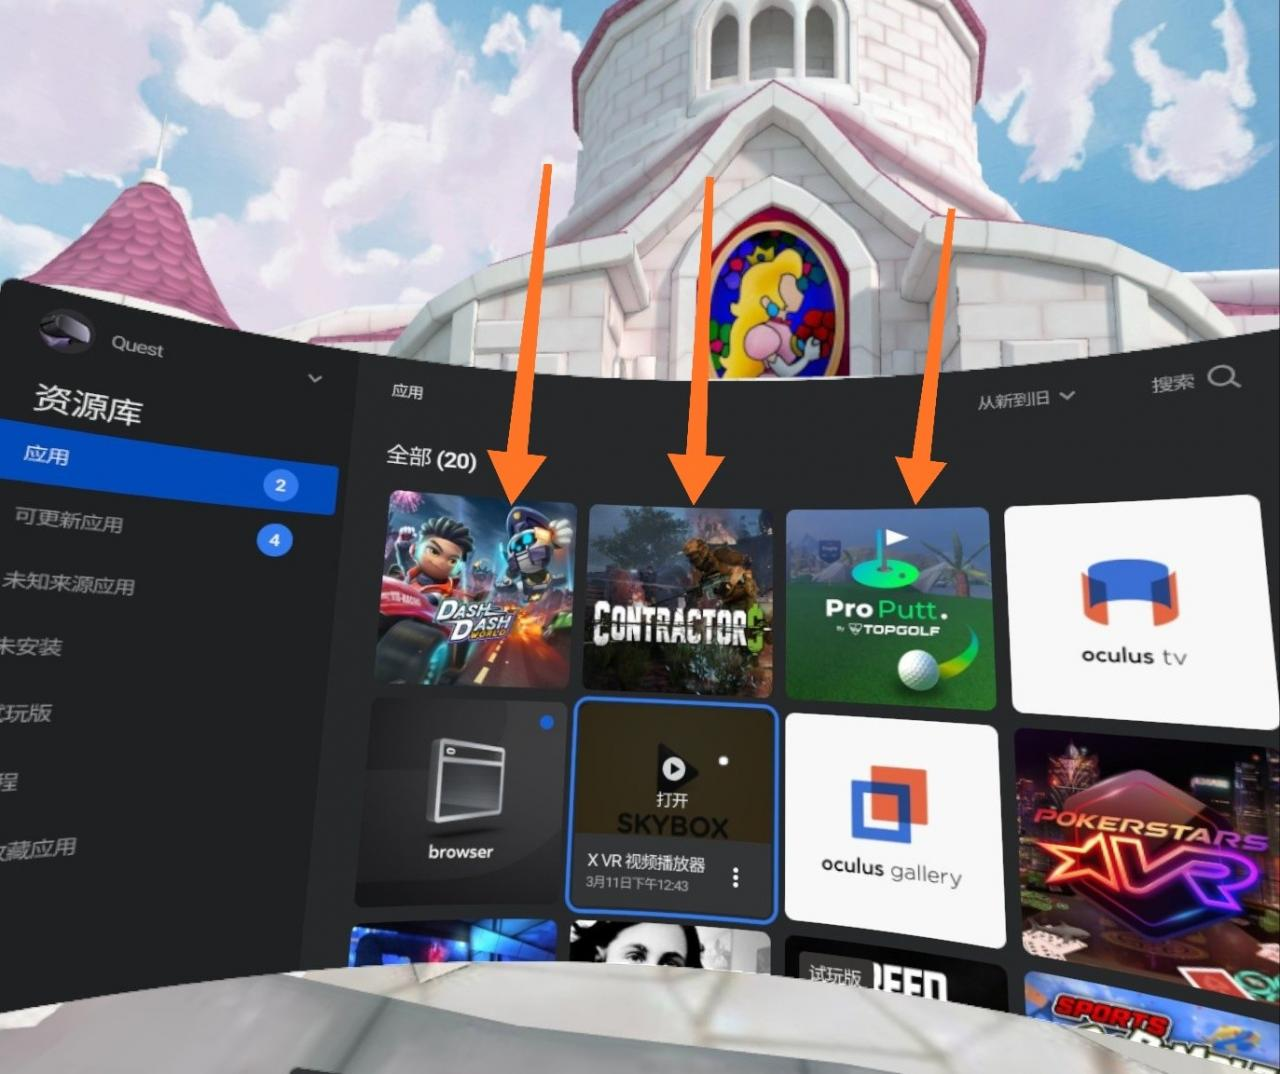 Oculus Quest 游戏《Contractors VR》使命召唤VR or 包工头插图(4)